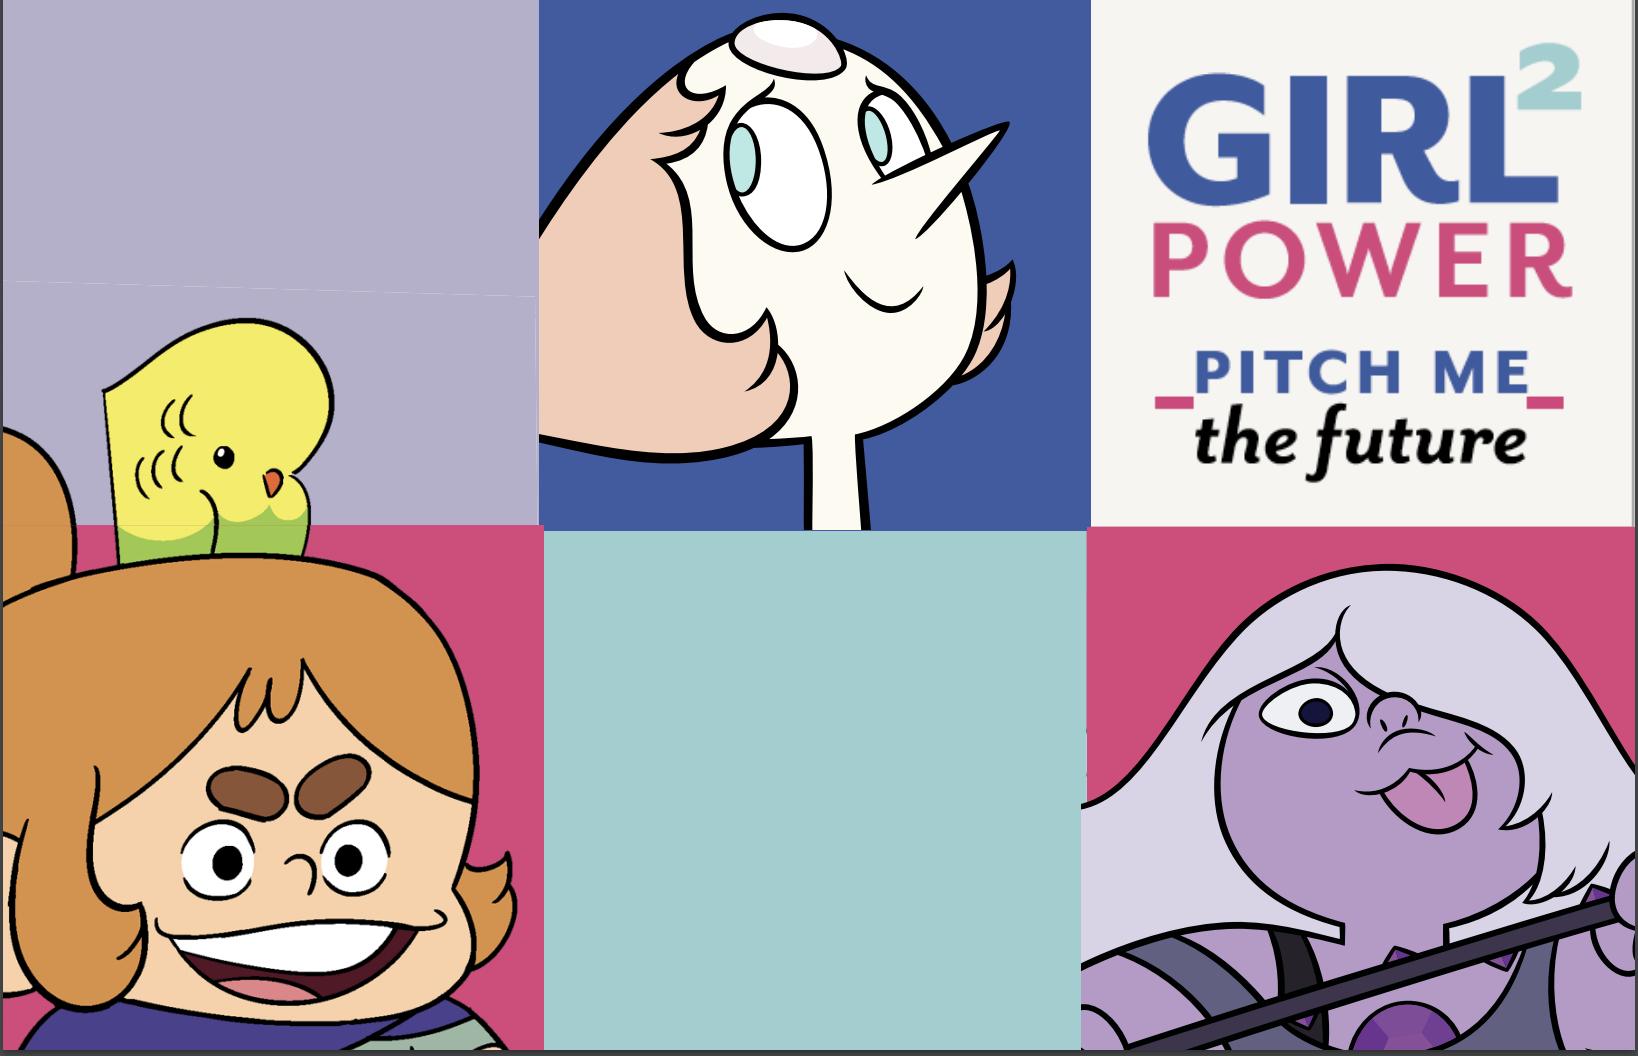 GirlPower2PitchMeTheFuture, CartoonNetwork, Pixelatl, GirlPower 2, Pitch Me The Future, Girl Power Pitch Me The Future, Girl Power